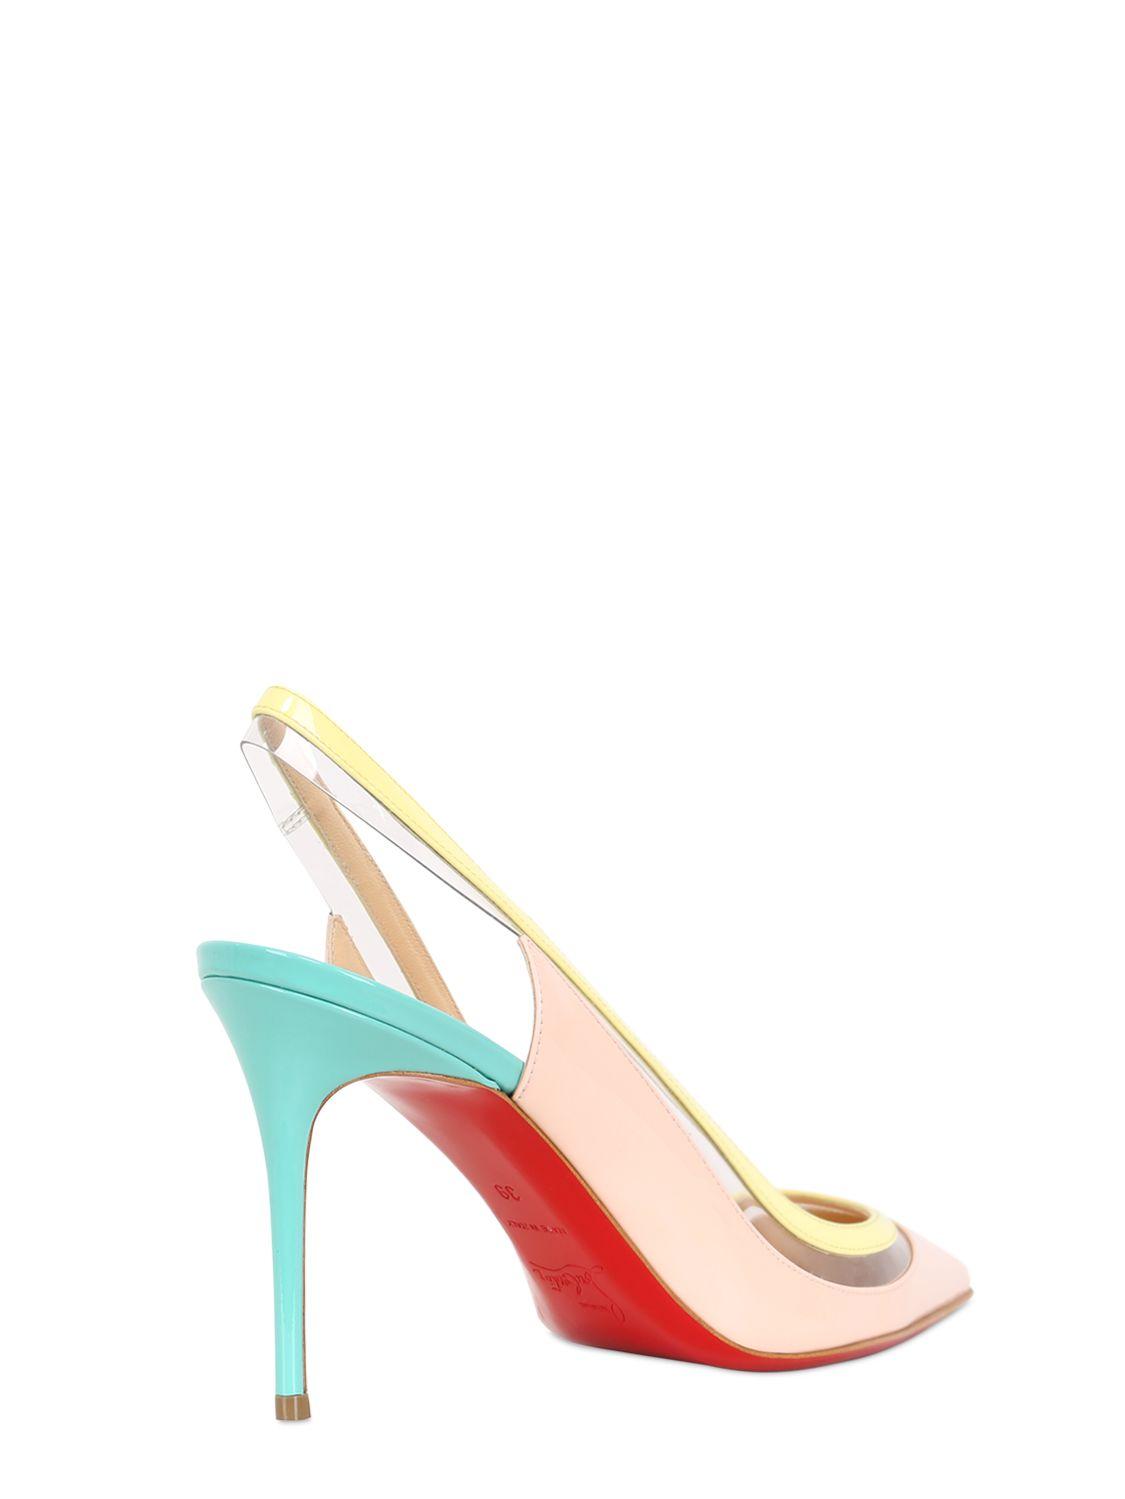 red christian louboutin men shoes - christian louboutin 100mm paulina pumps - Bavilon Salon